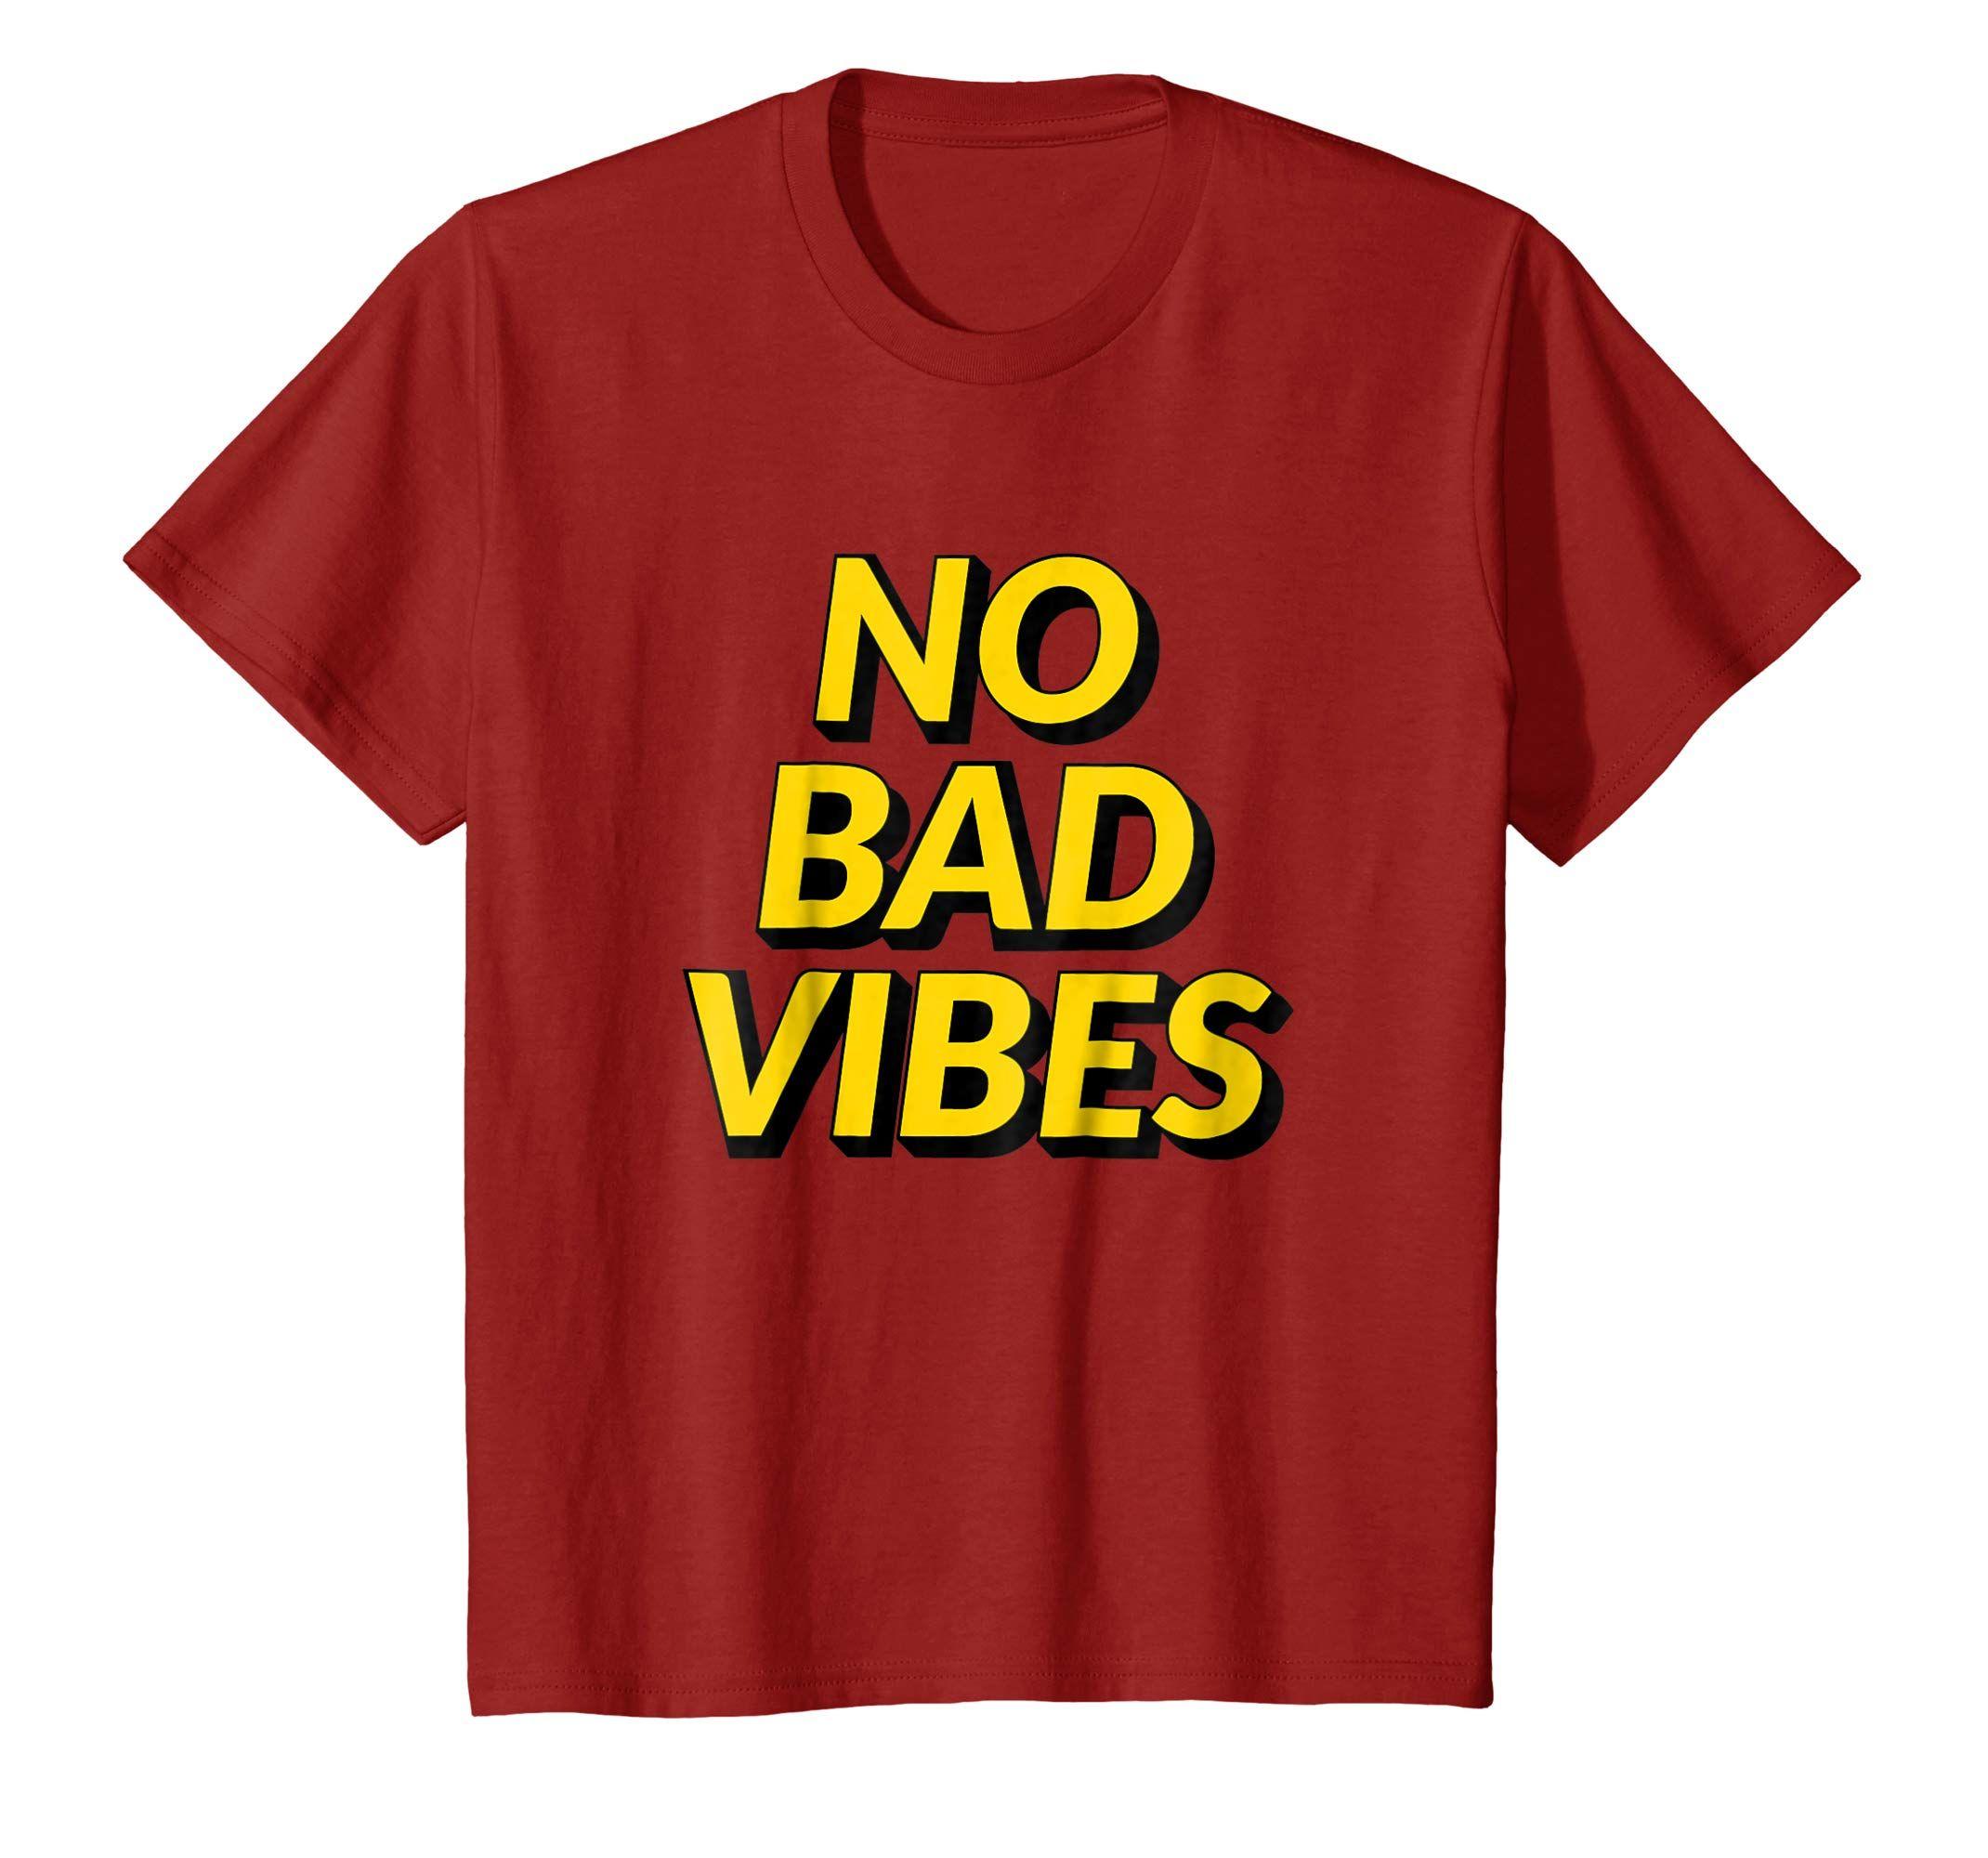 Aesthetic T Shirts Amazon